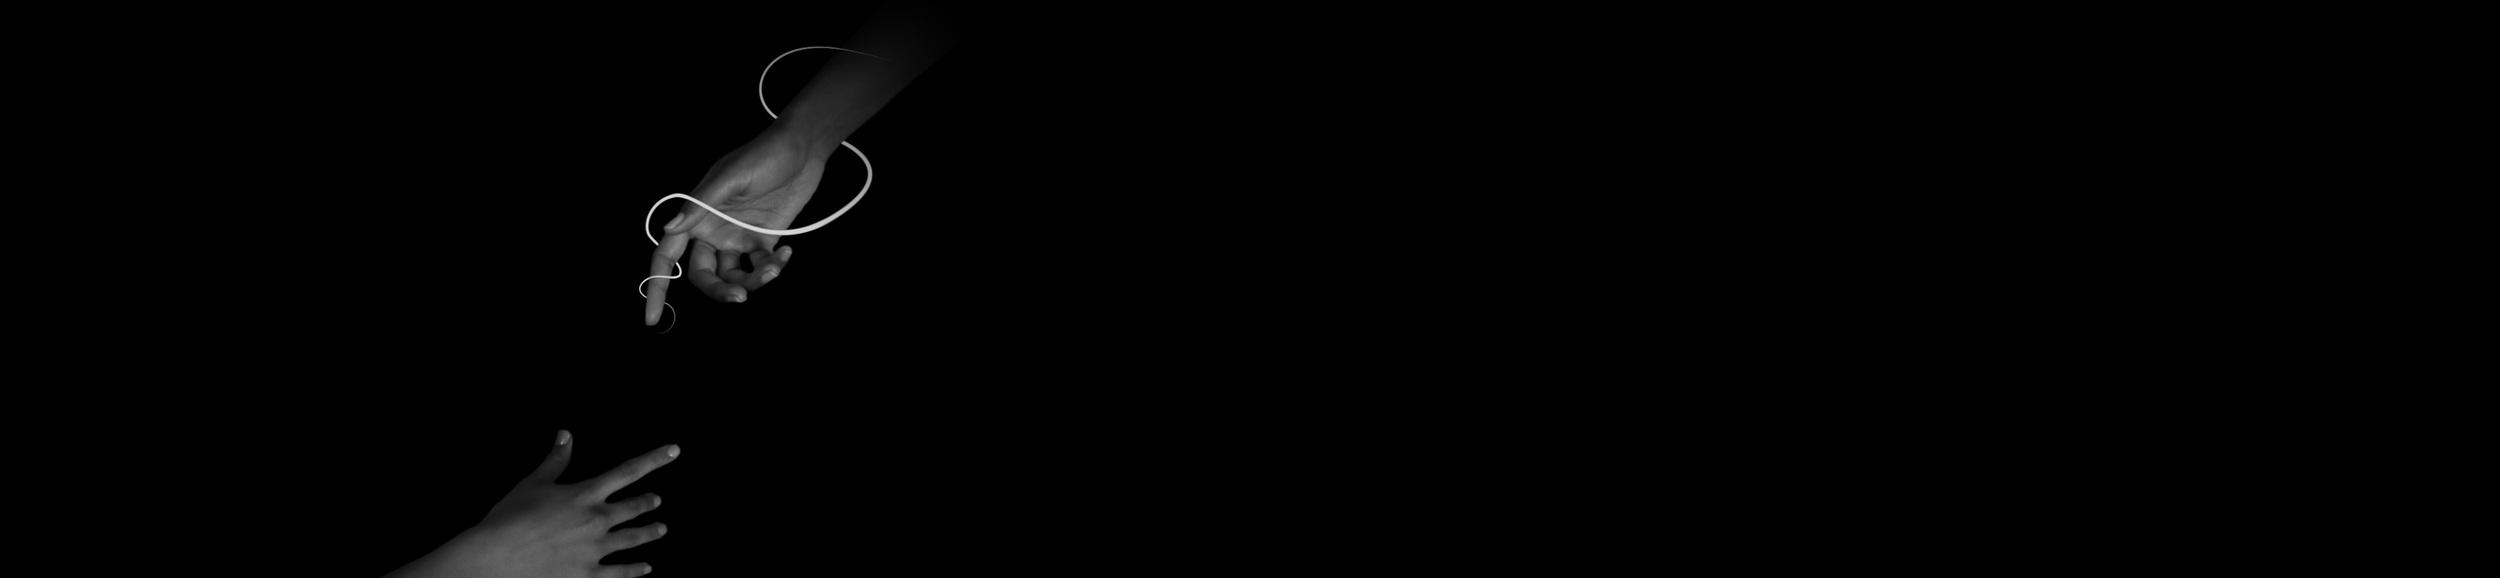 PH_WALL_3PROJECTORS_H900_FINAL_AUD01_01413.jpg